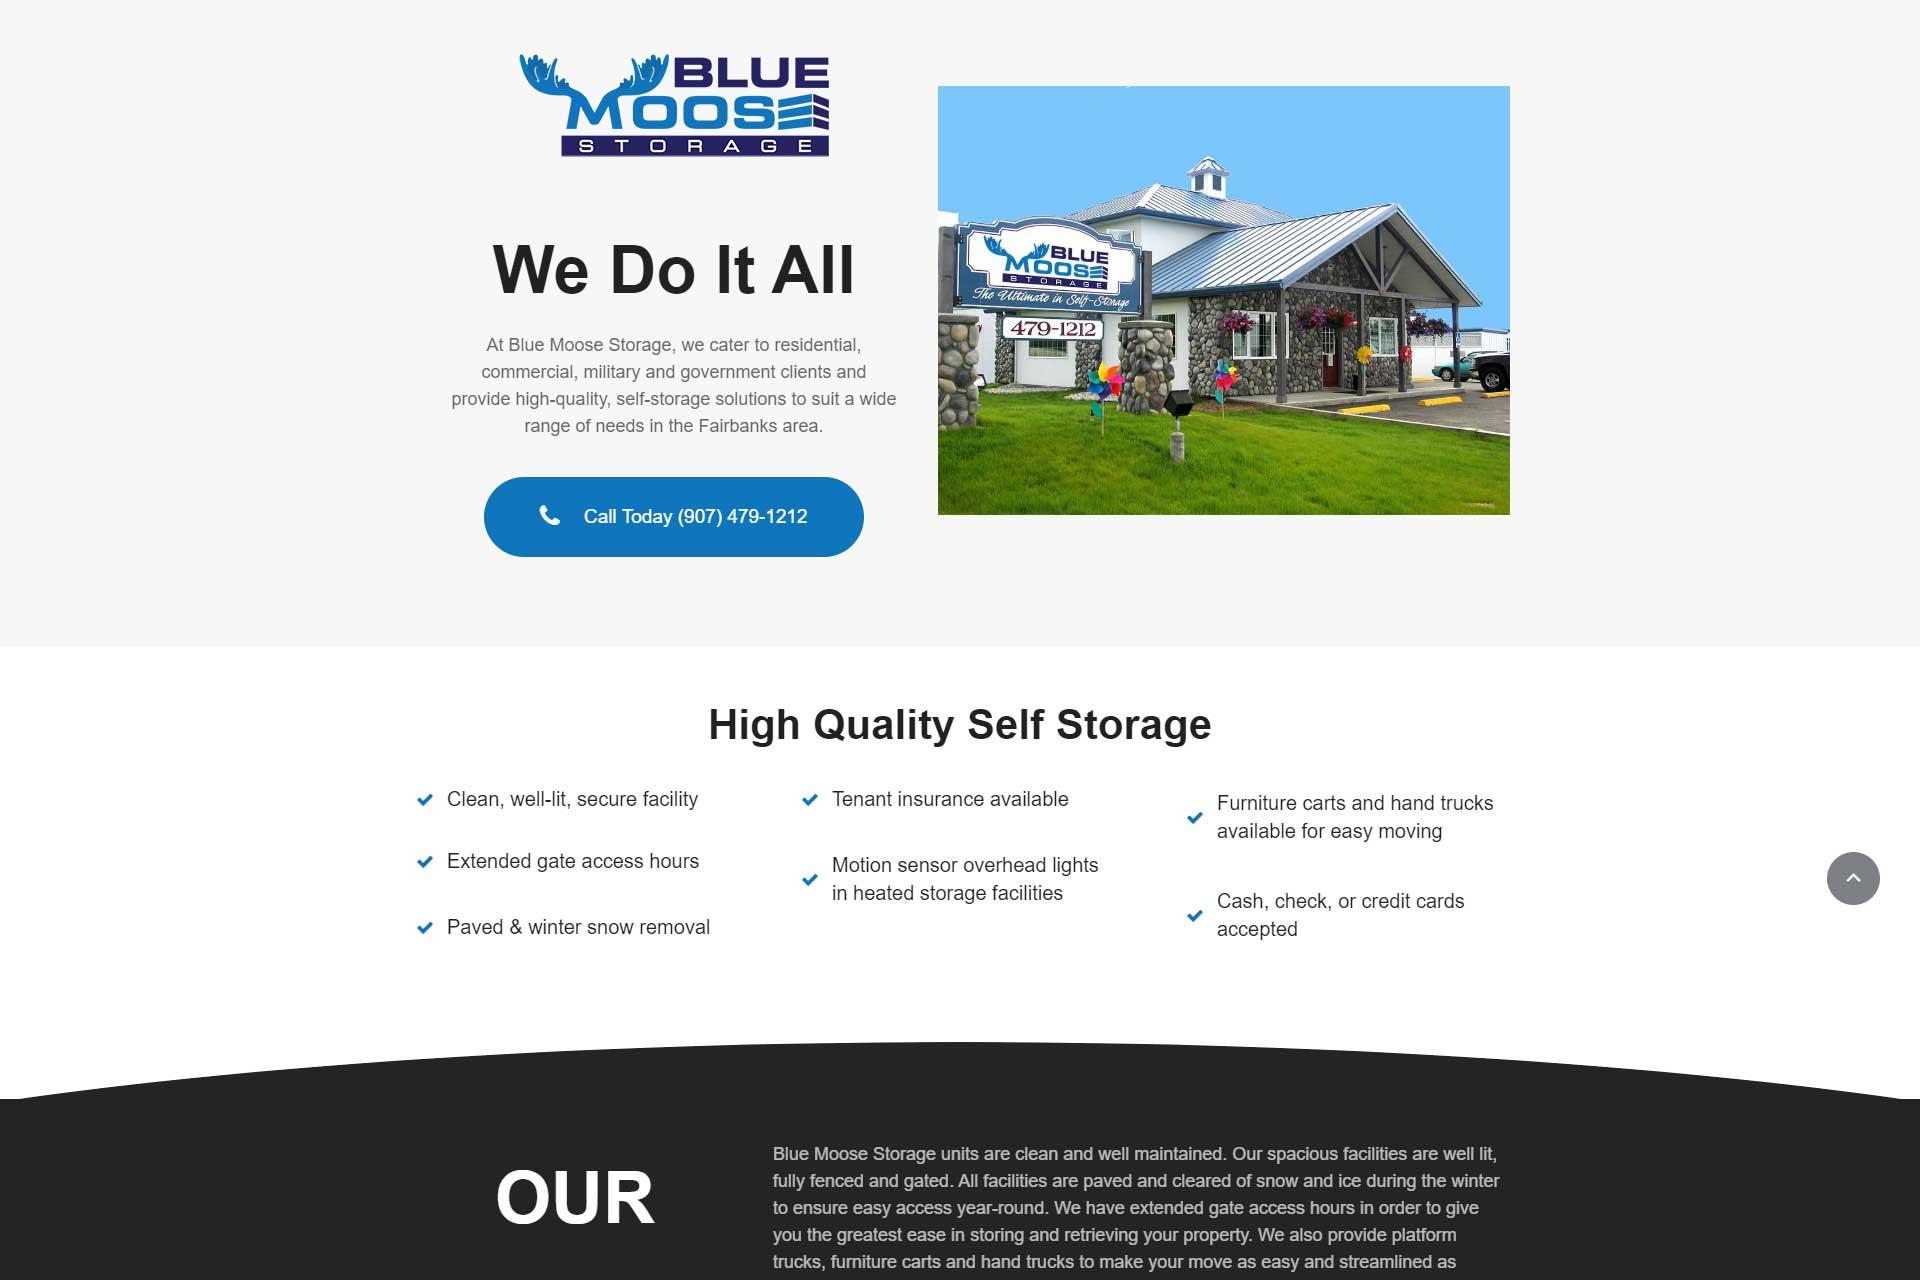 Blue Moose Storage